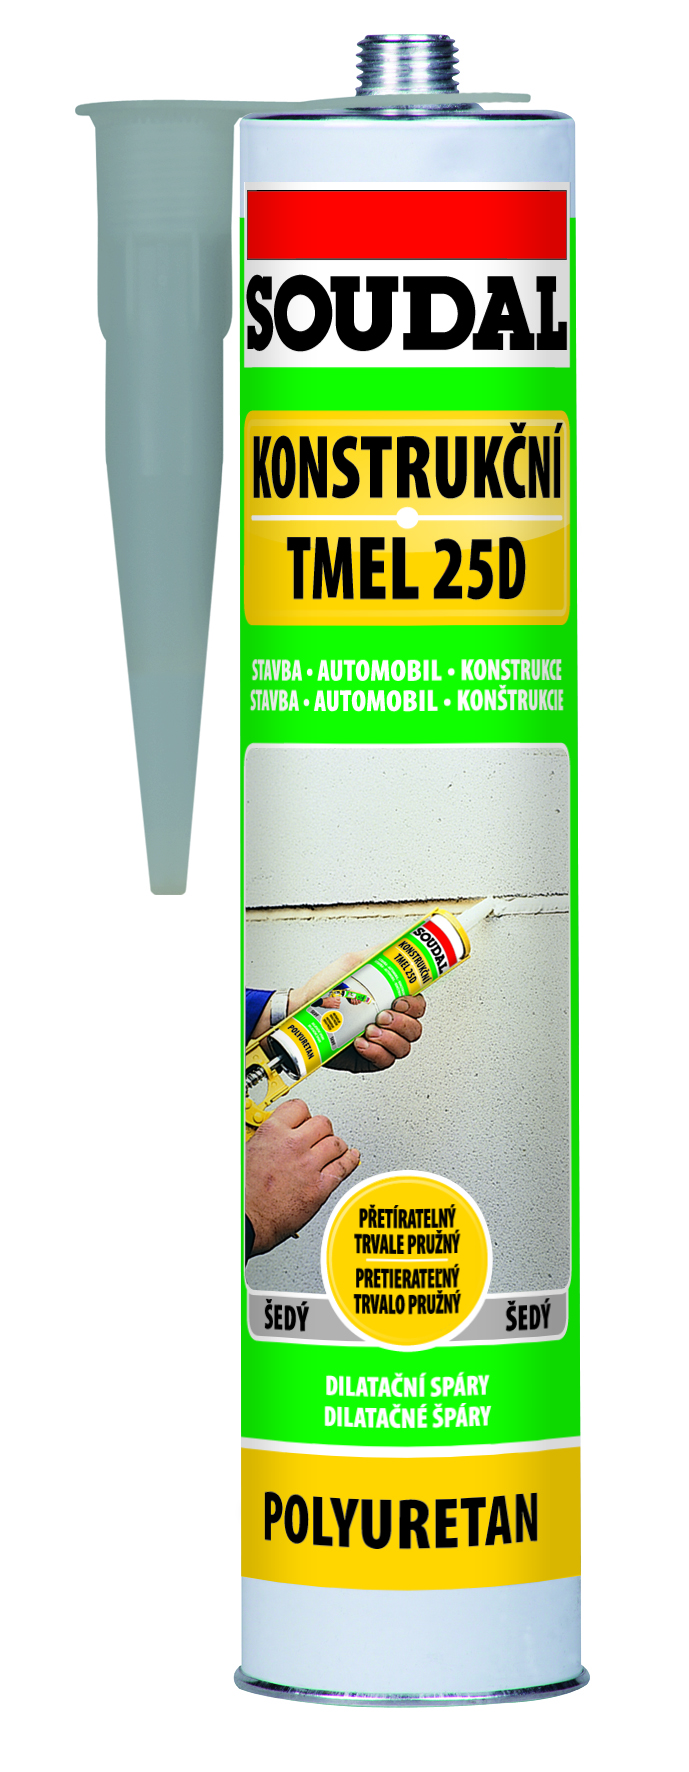 Soudal Konstrukční tmel 25D 310ml elastický polyuretanový